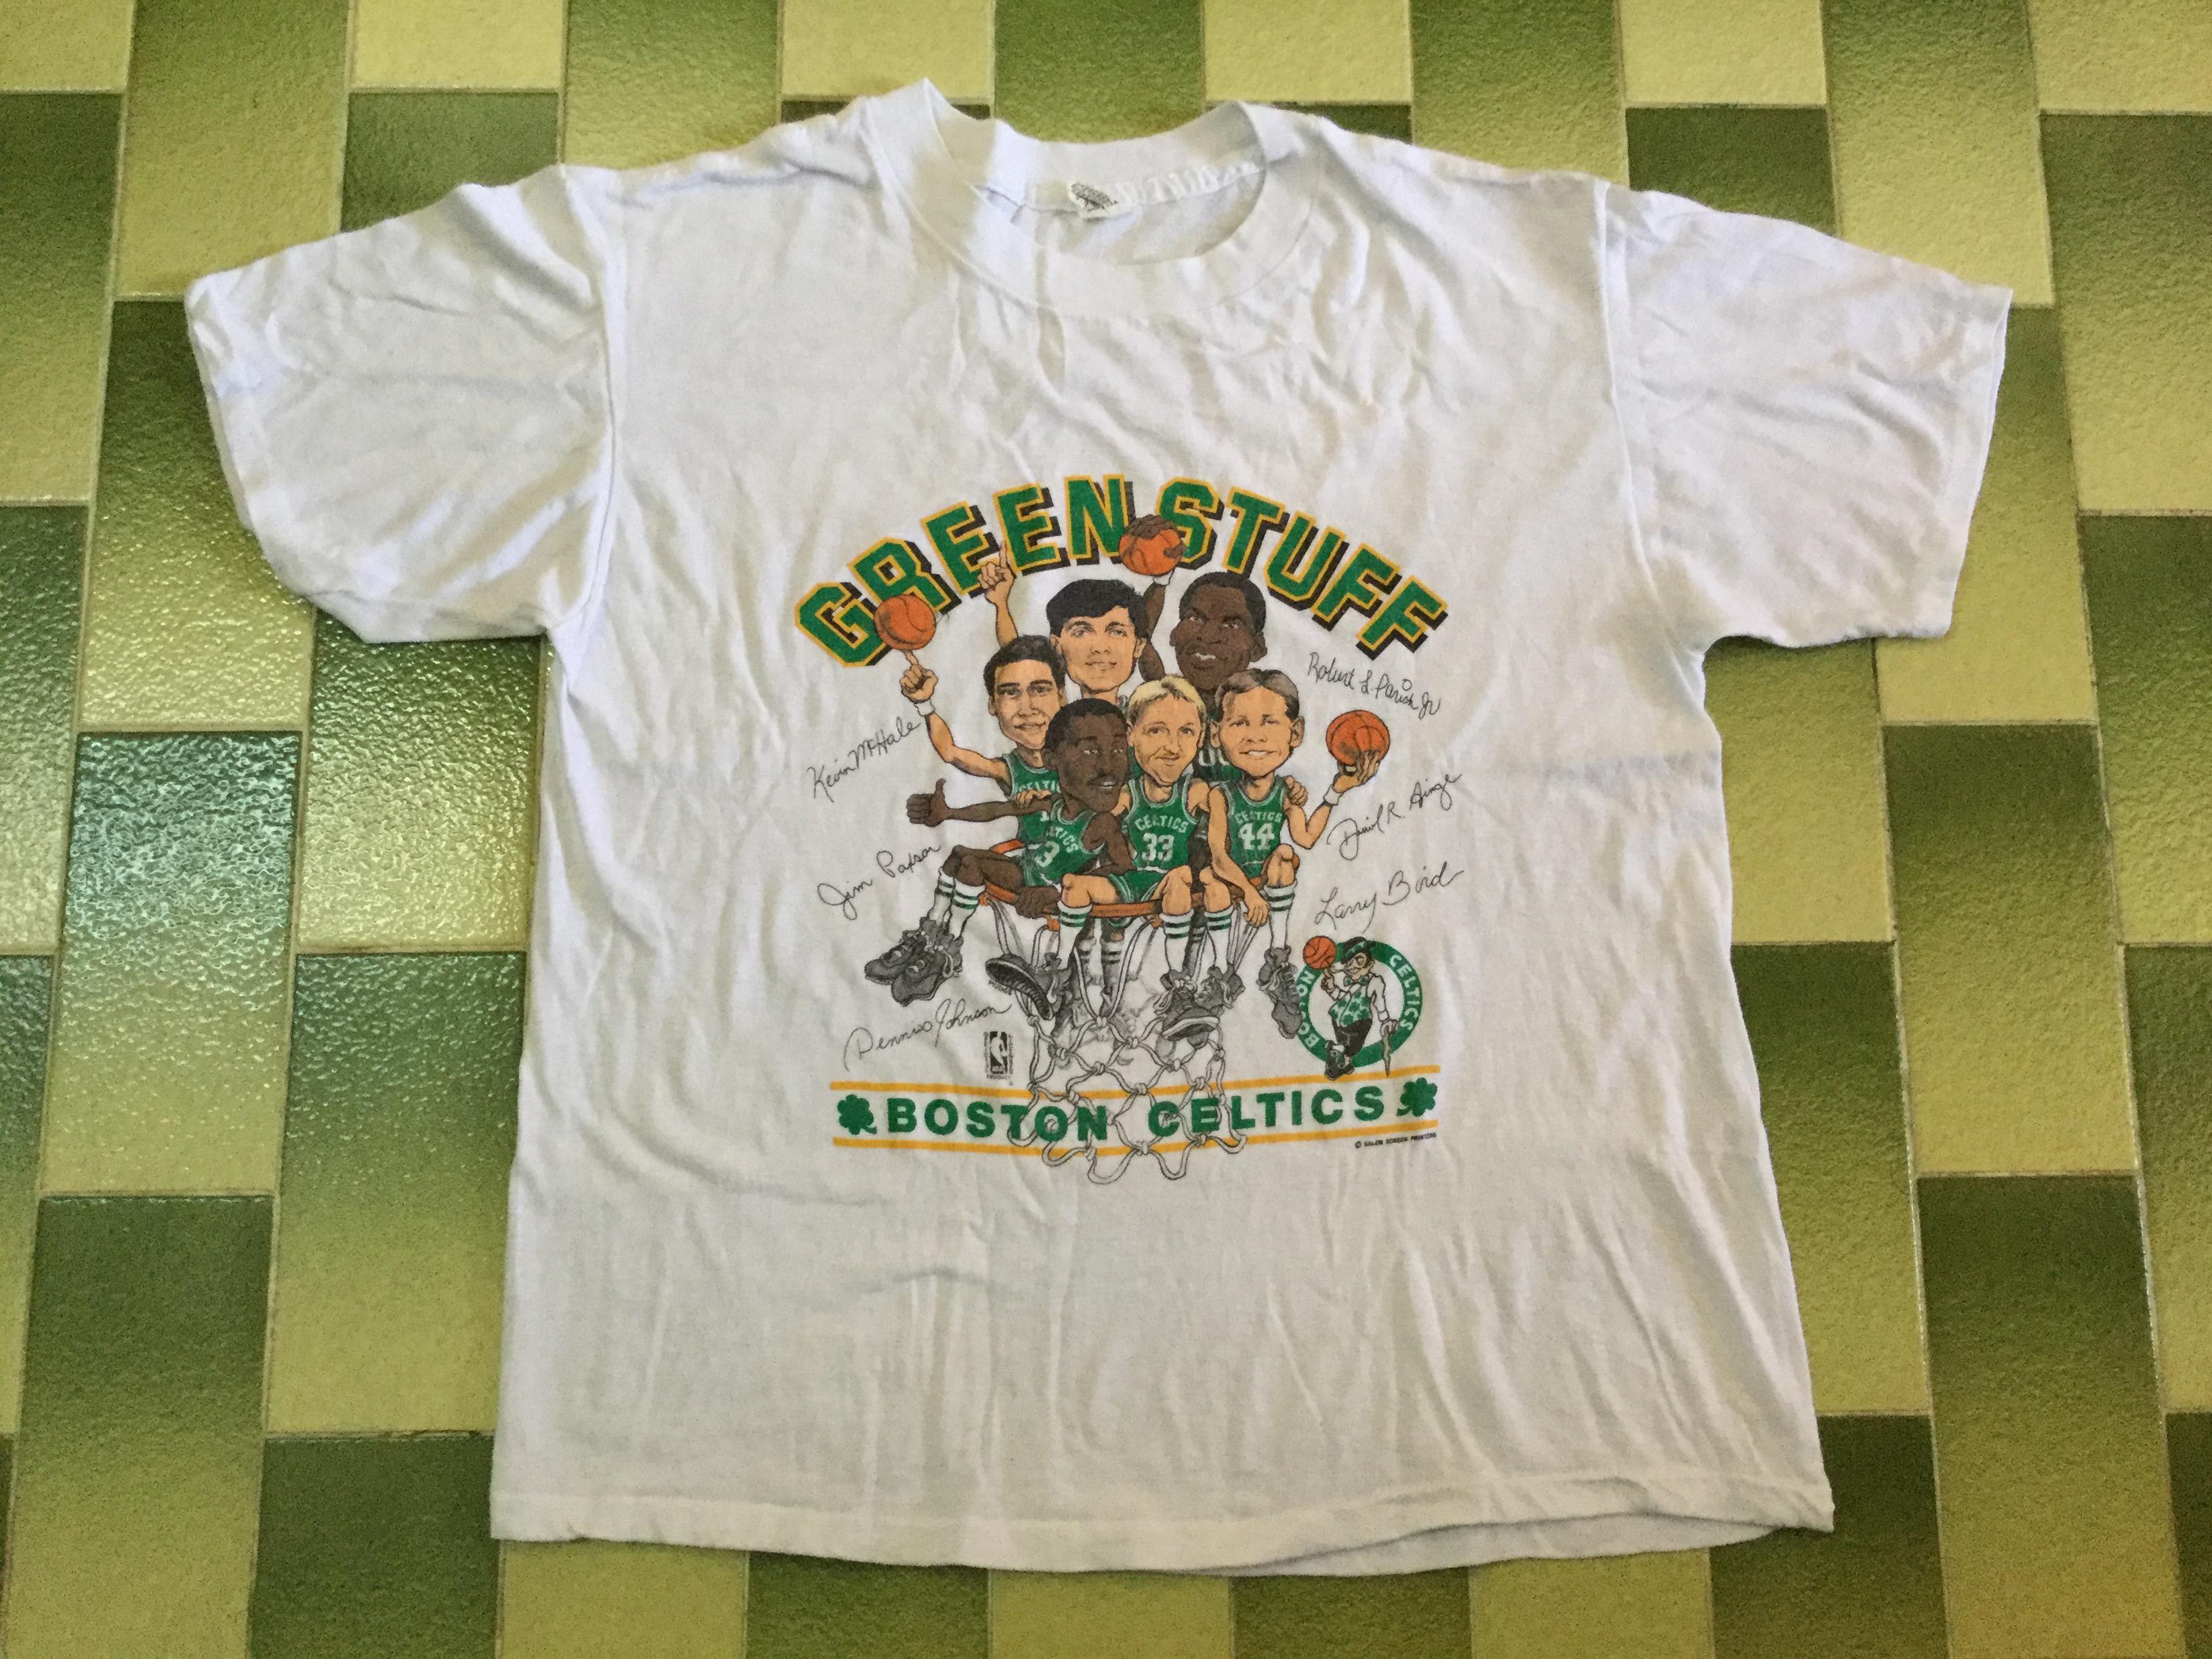 0c0834ab6670 Vintage × Nba × Made In Usa. Vintage 80s Boston Celtics Green Stuff  Caricature Larry Bird Kevin McHale t-shirt NBA basketball ...